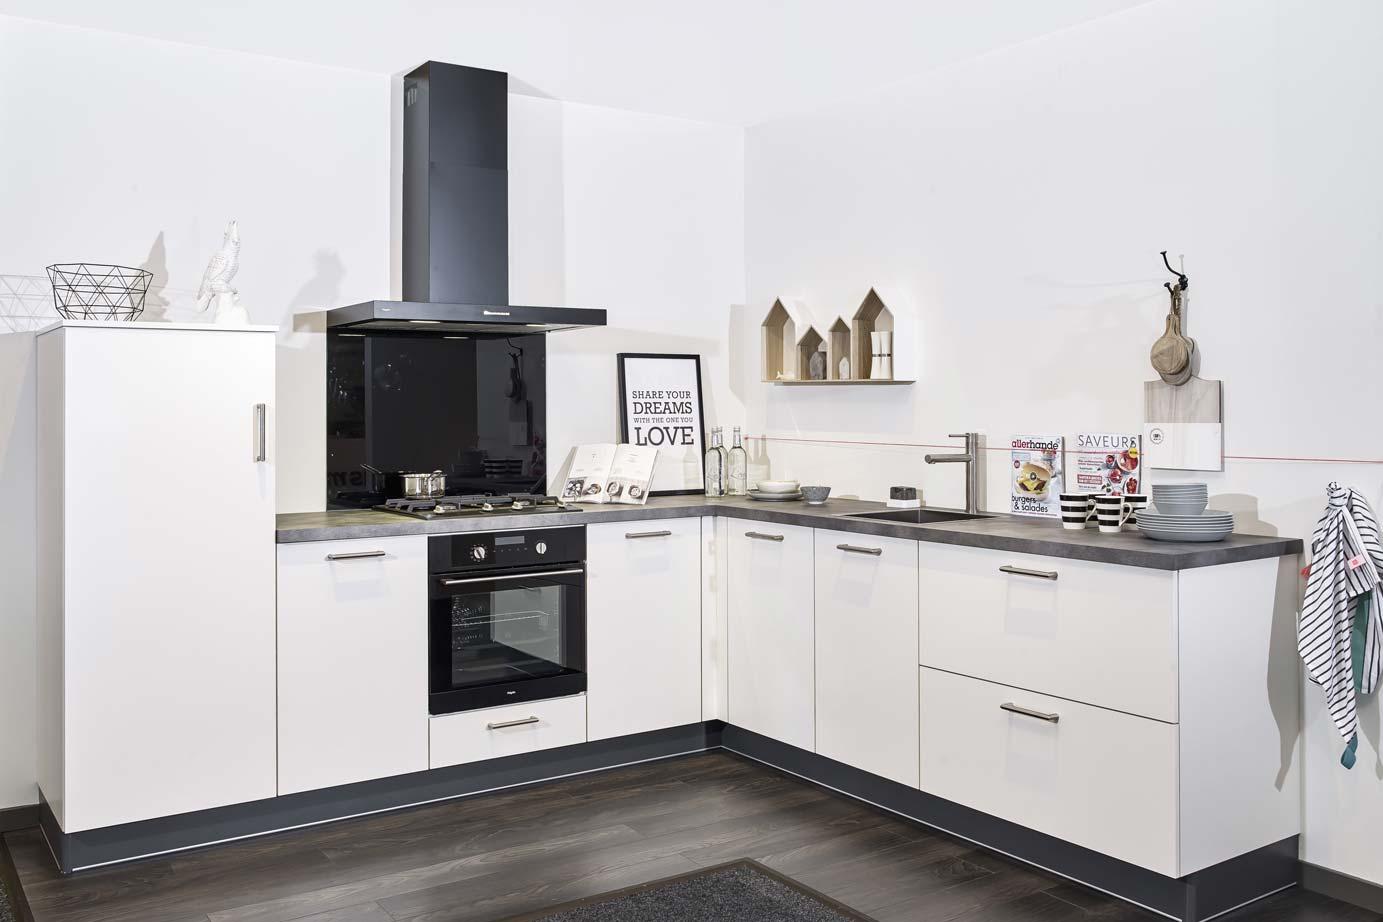 Showoom keukens keukens uit voorraad modellen